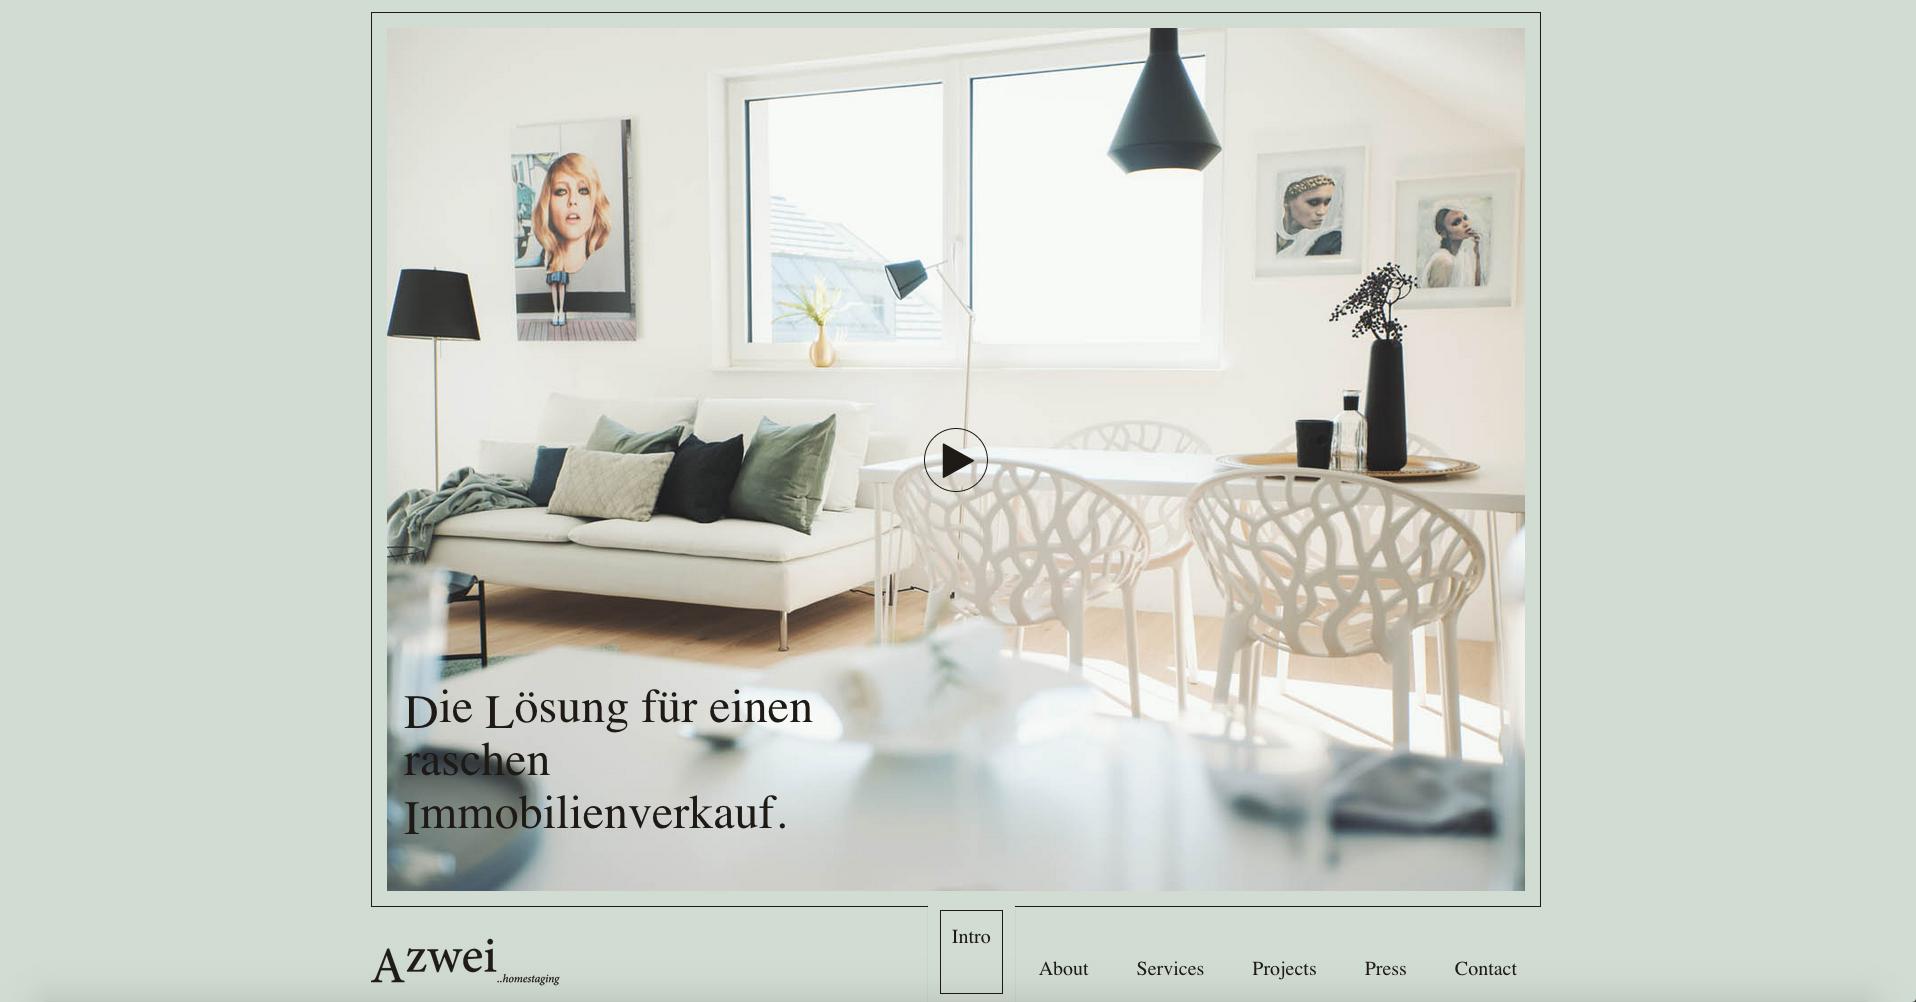 Fresh Herbs Communications Marketing Projektmanagement Website Salzburg_1_AZwei